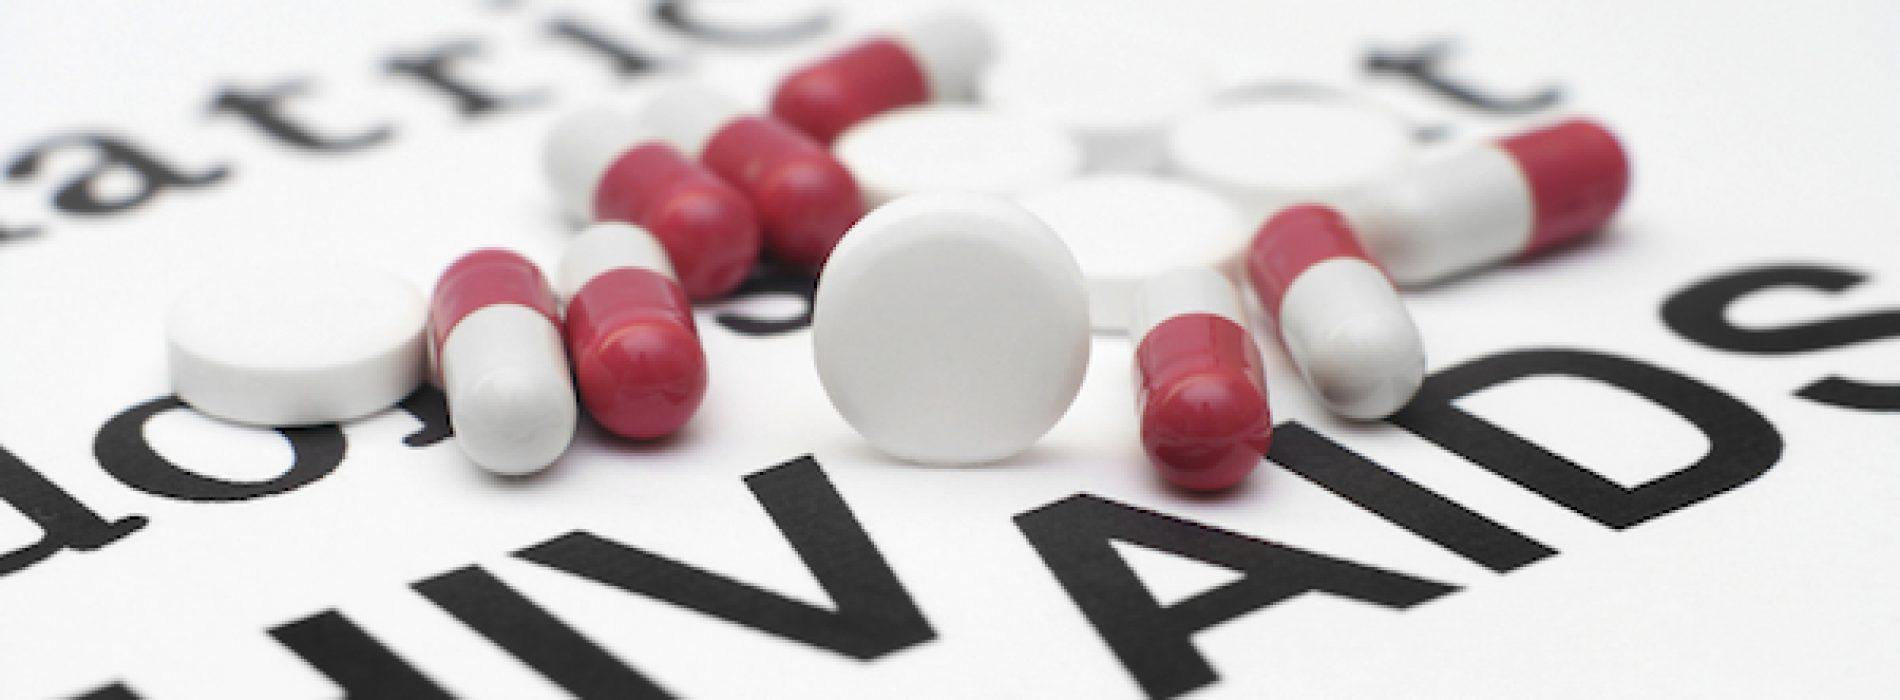 A novel approach to fight HIV